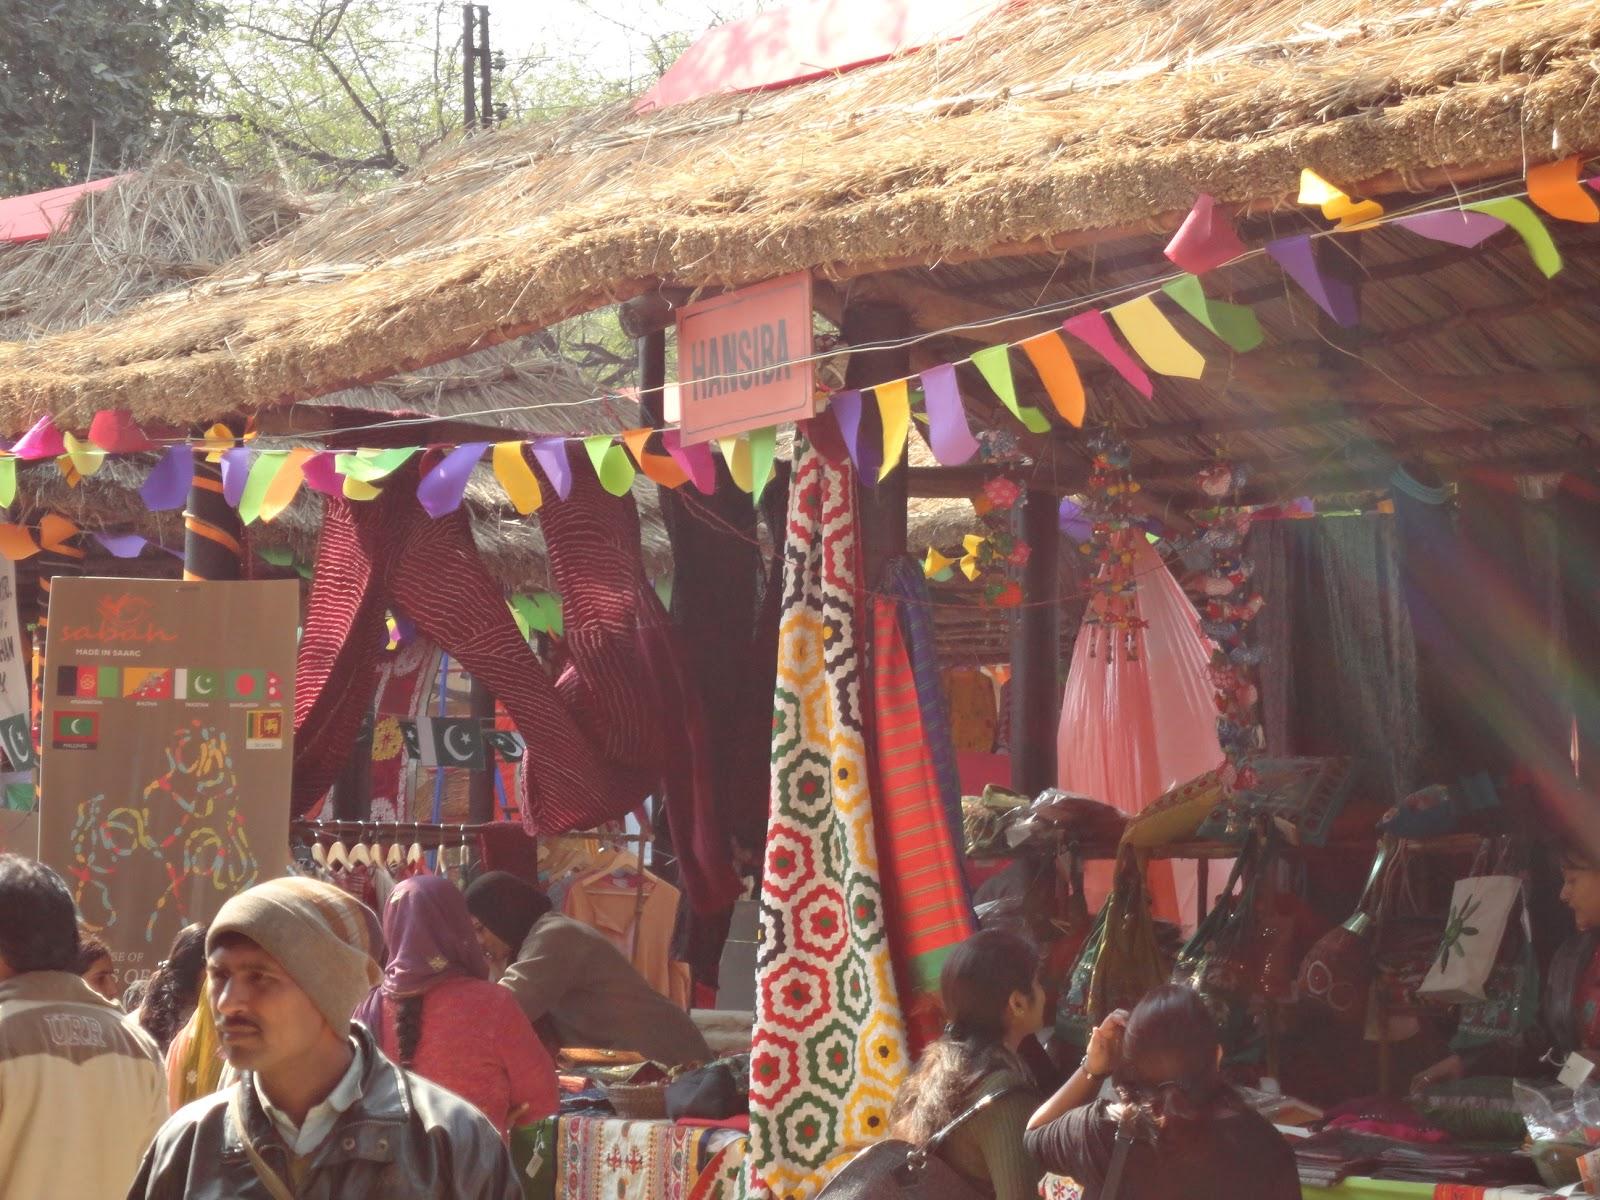 The Hansiba Stall at Surajkund Crafts Mela,India